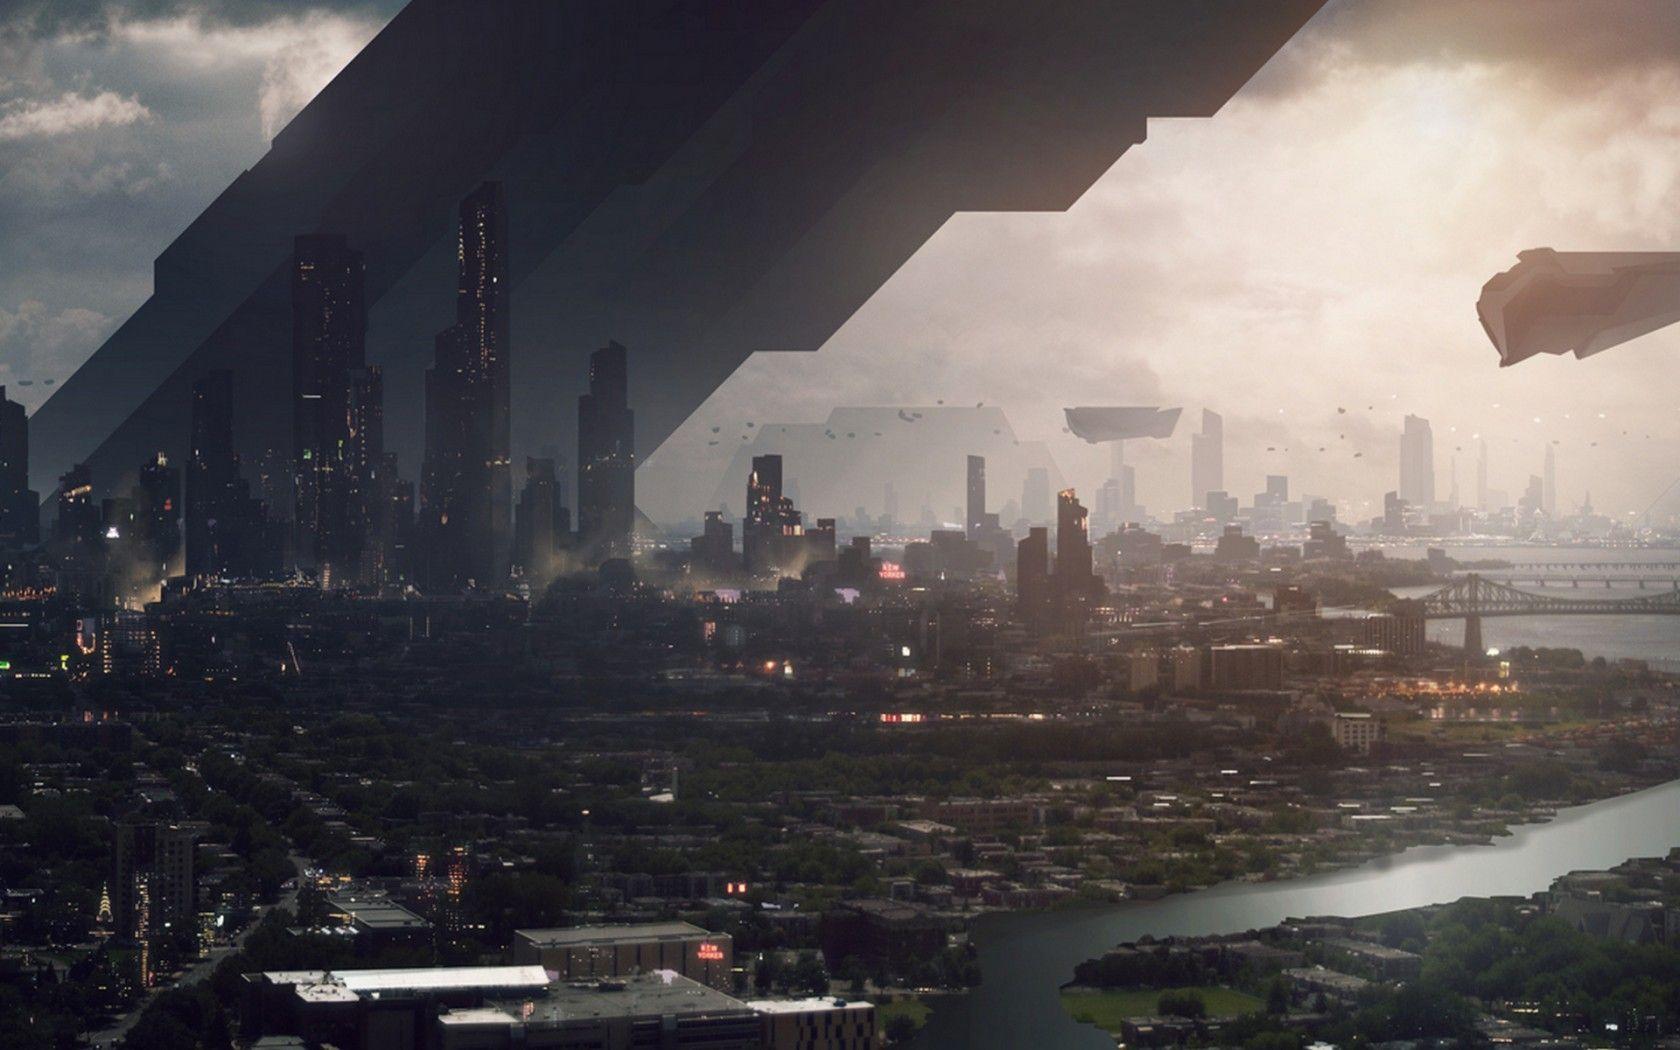 Starship city lyrics